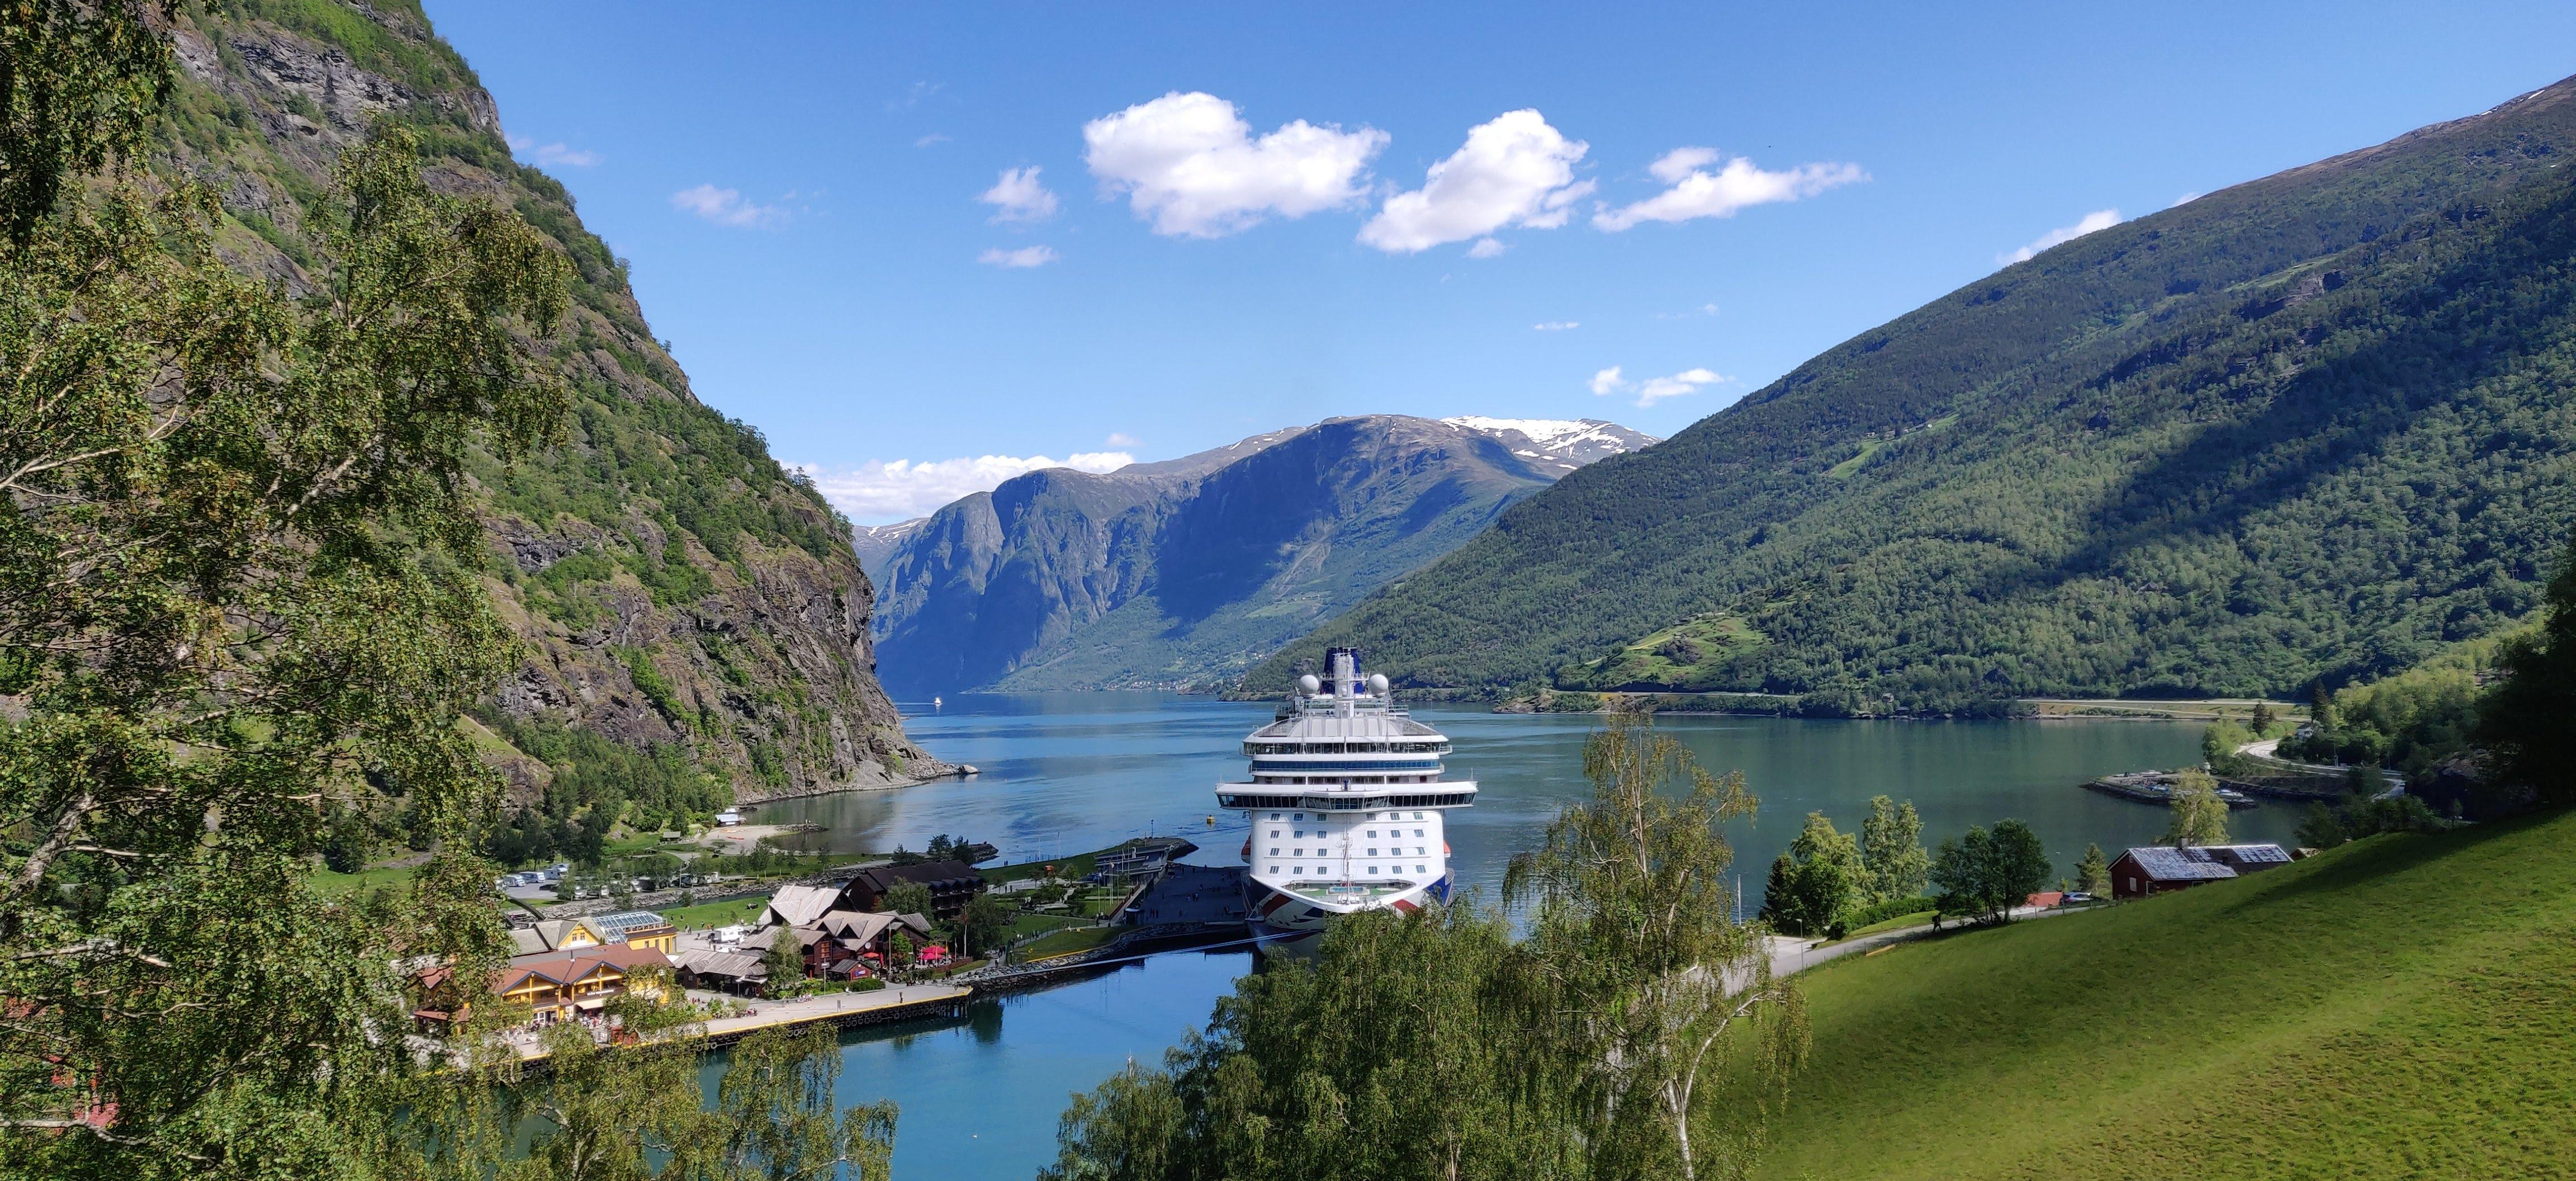 File:Flåm Norway P&O MV Britannia.jpg - Wikimedia Commons